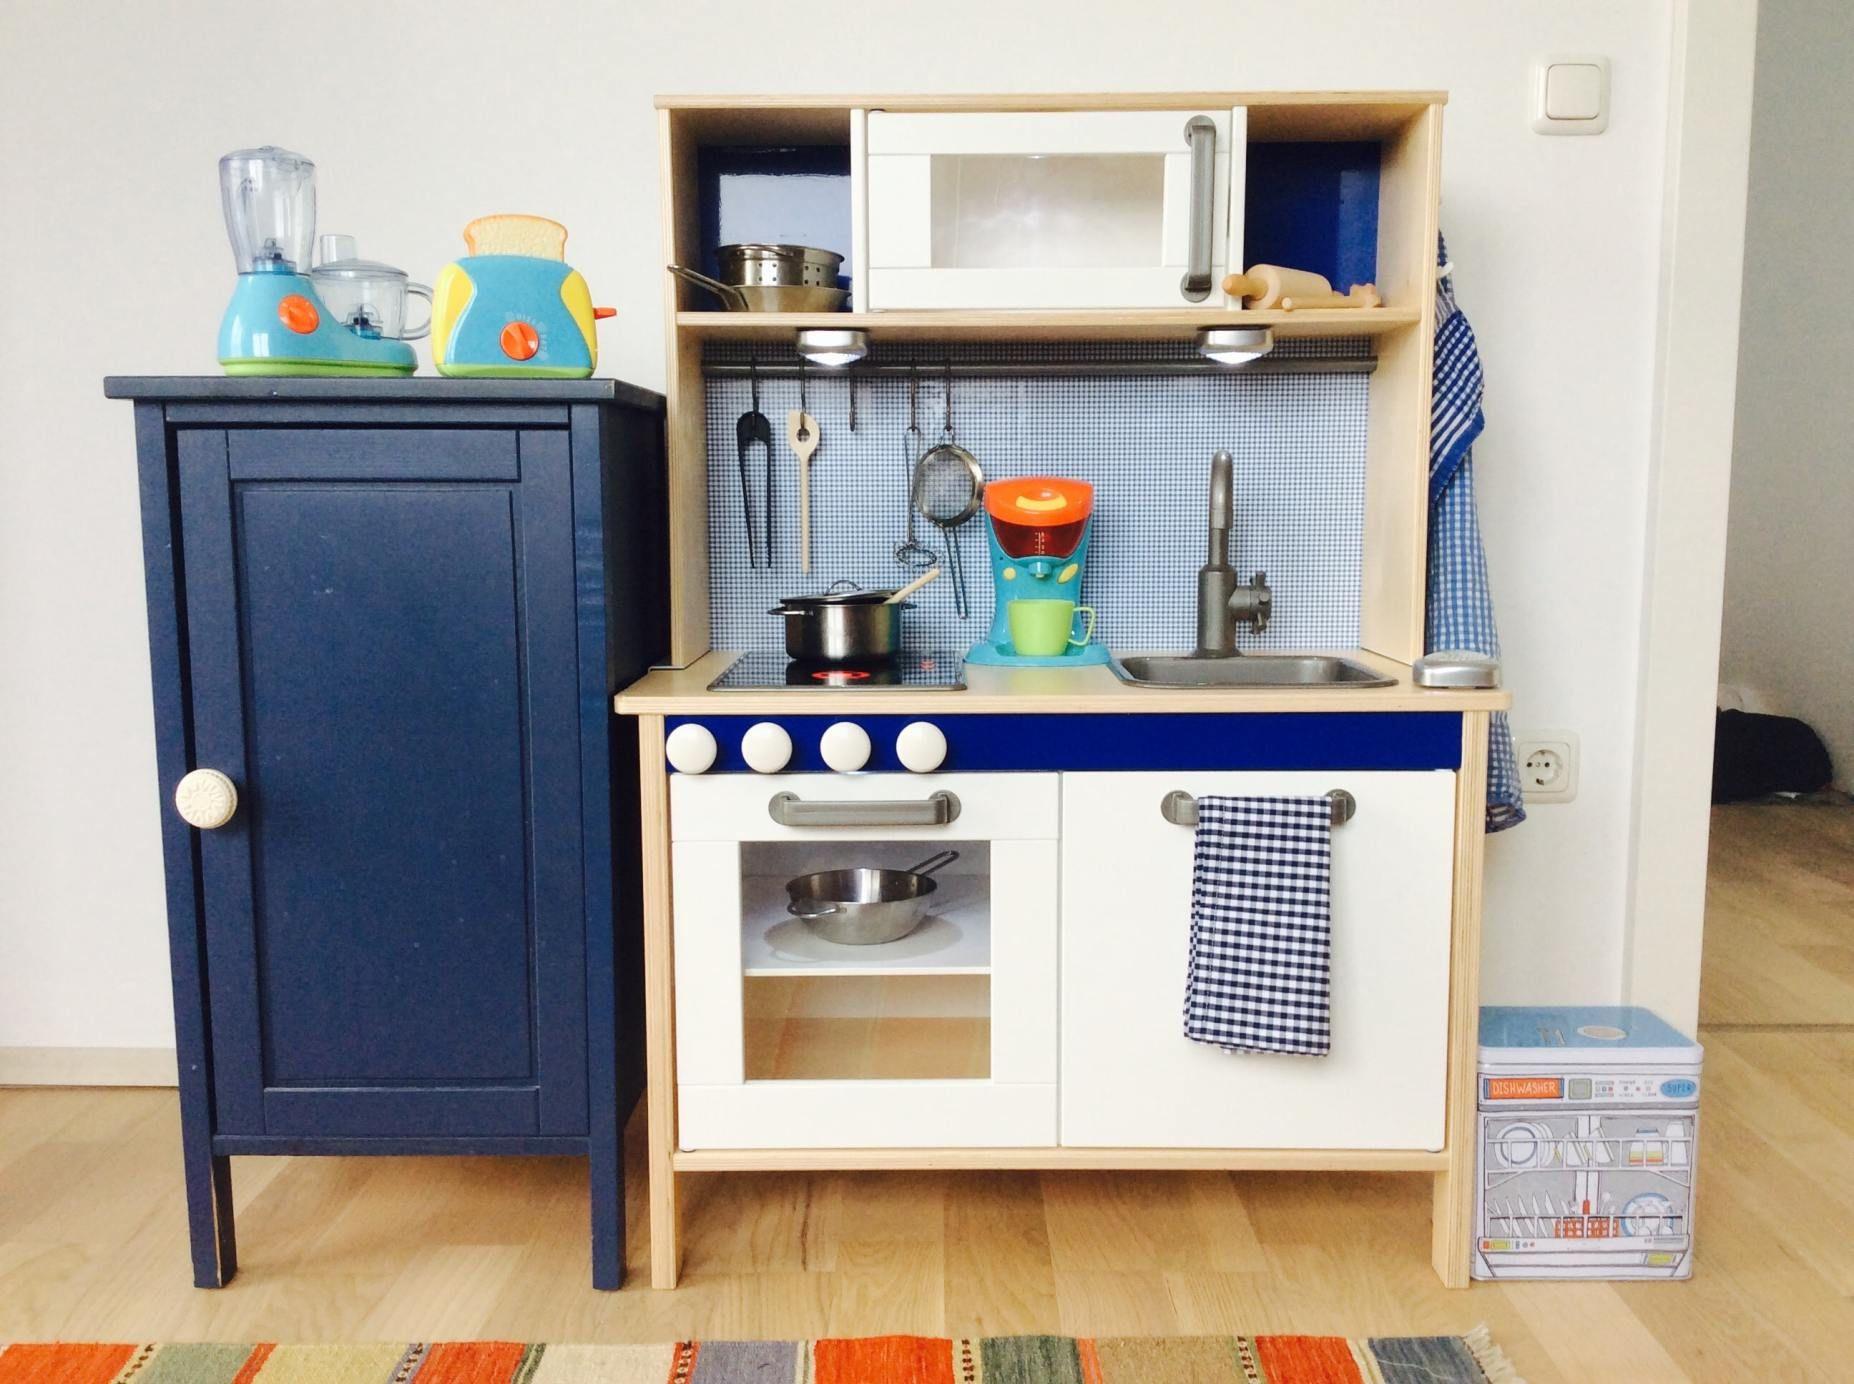 diy wir pimpen unsere kinderk che duktig zubeh r reyes. Black Bedroom Furniture Sets. Home Design Ideas